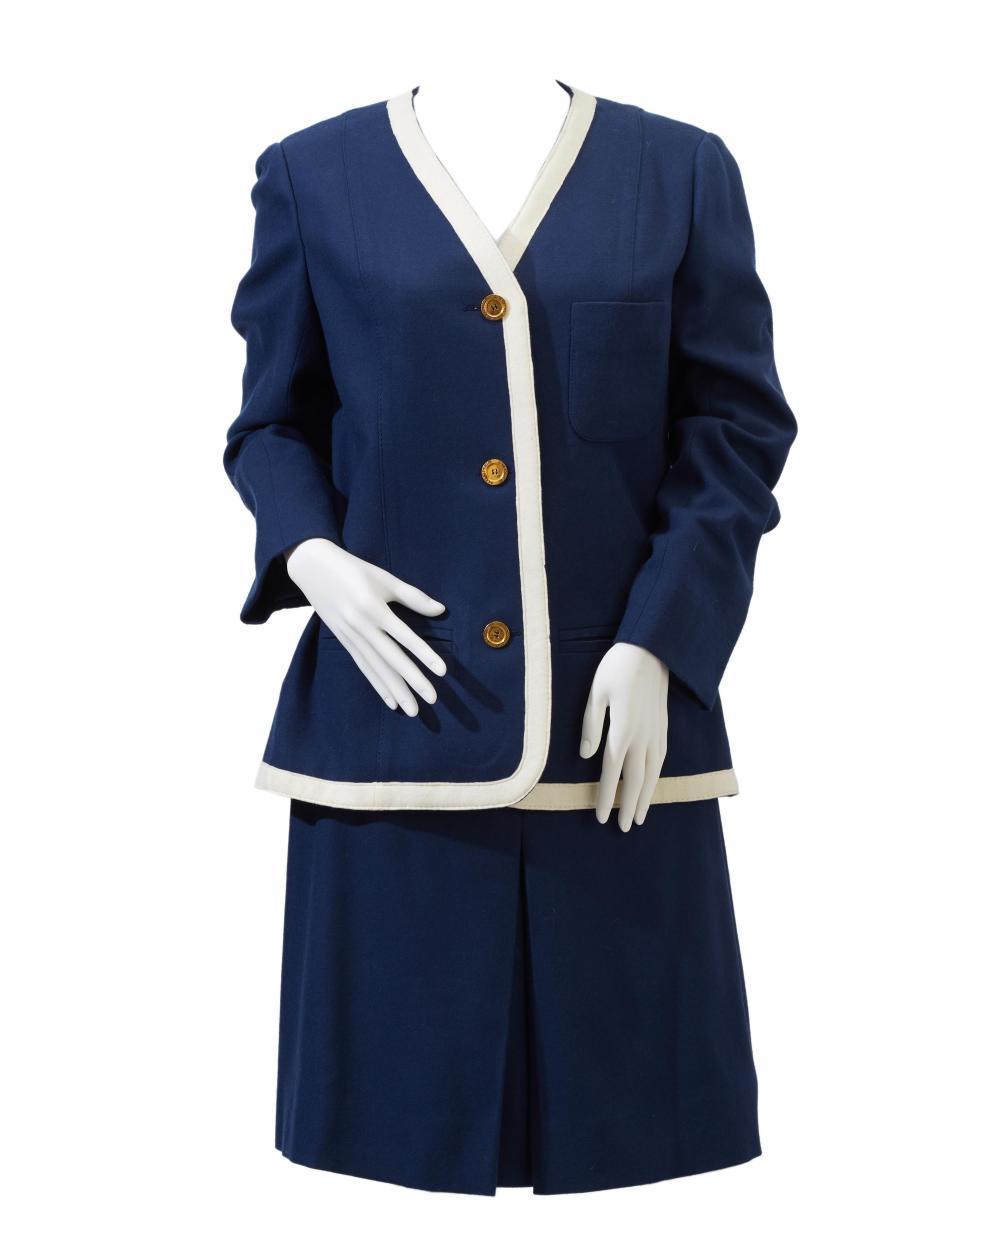 An Hermès Sport skirt suit